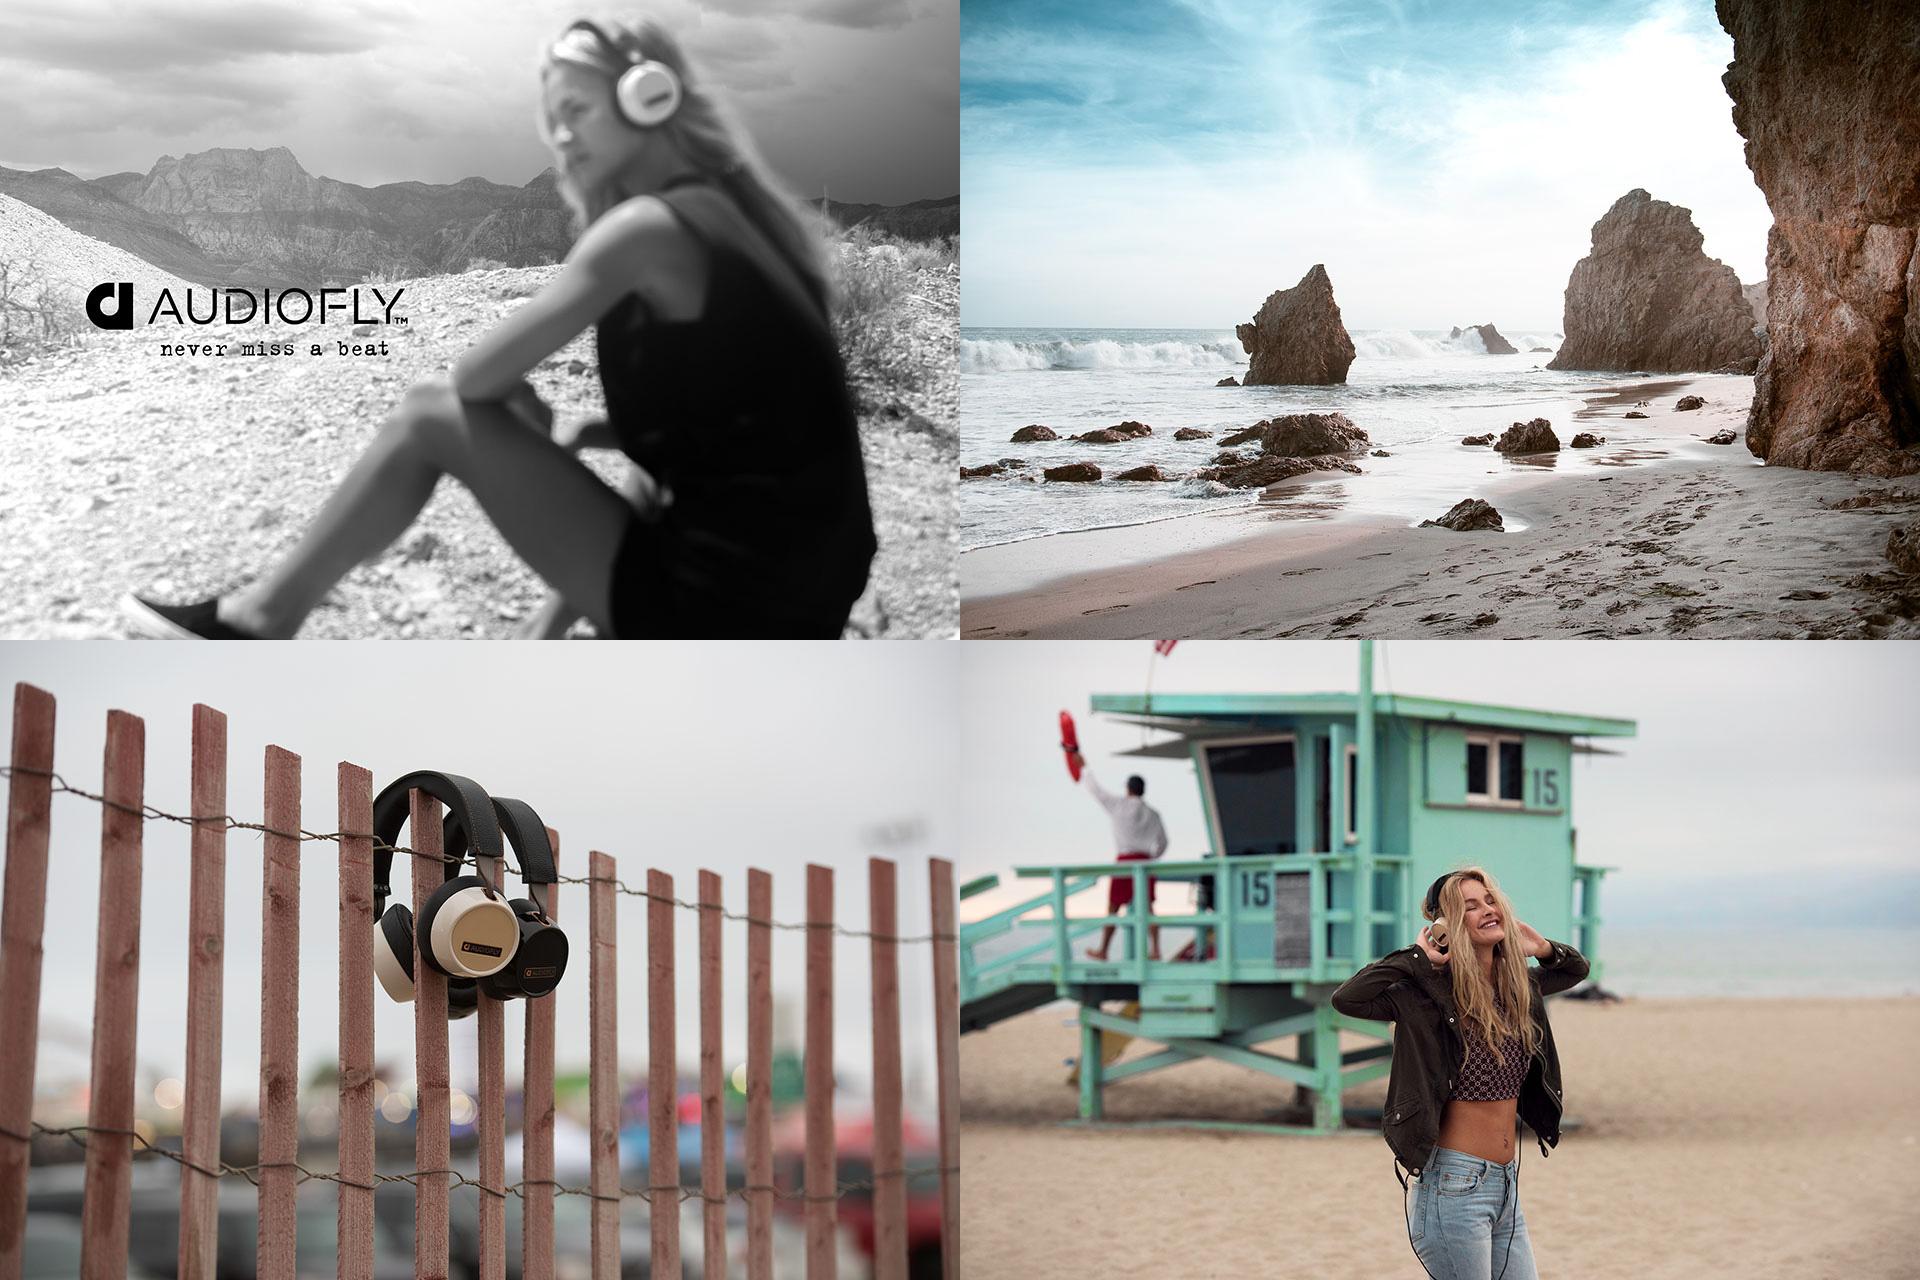 #AUDIOFLY, Branding, Marketing, Photography, Films